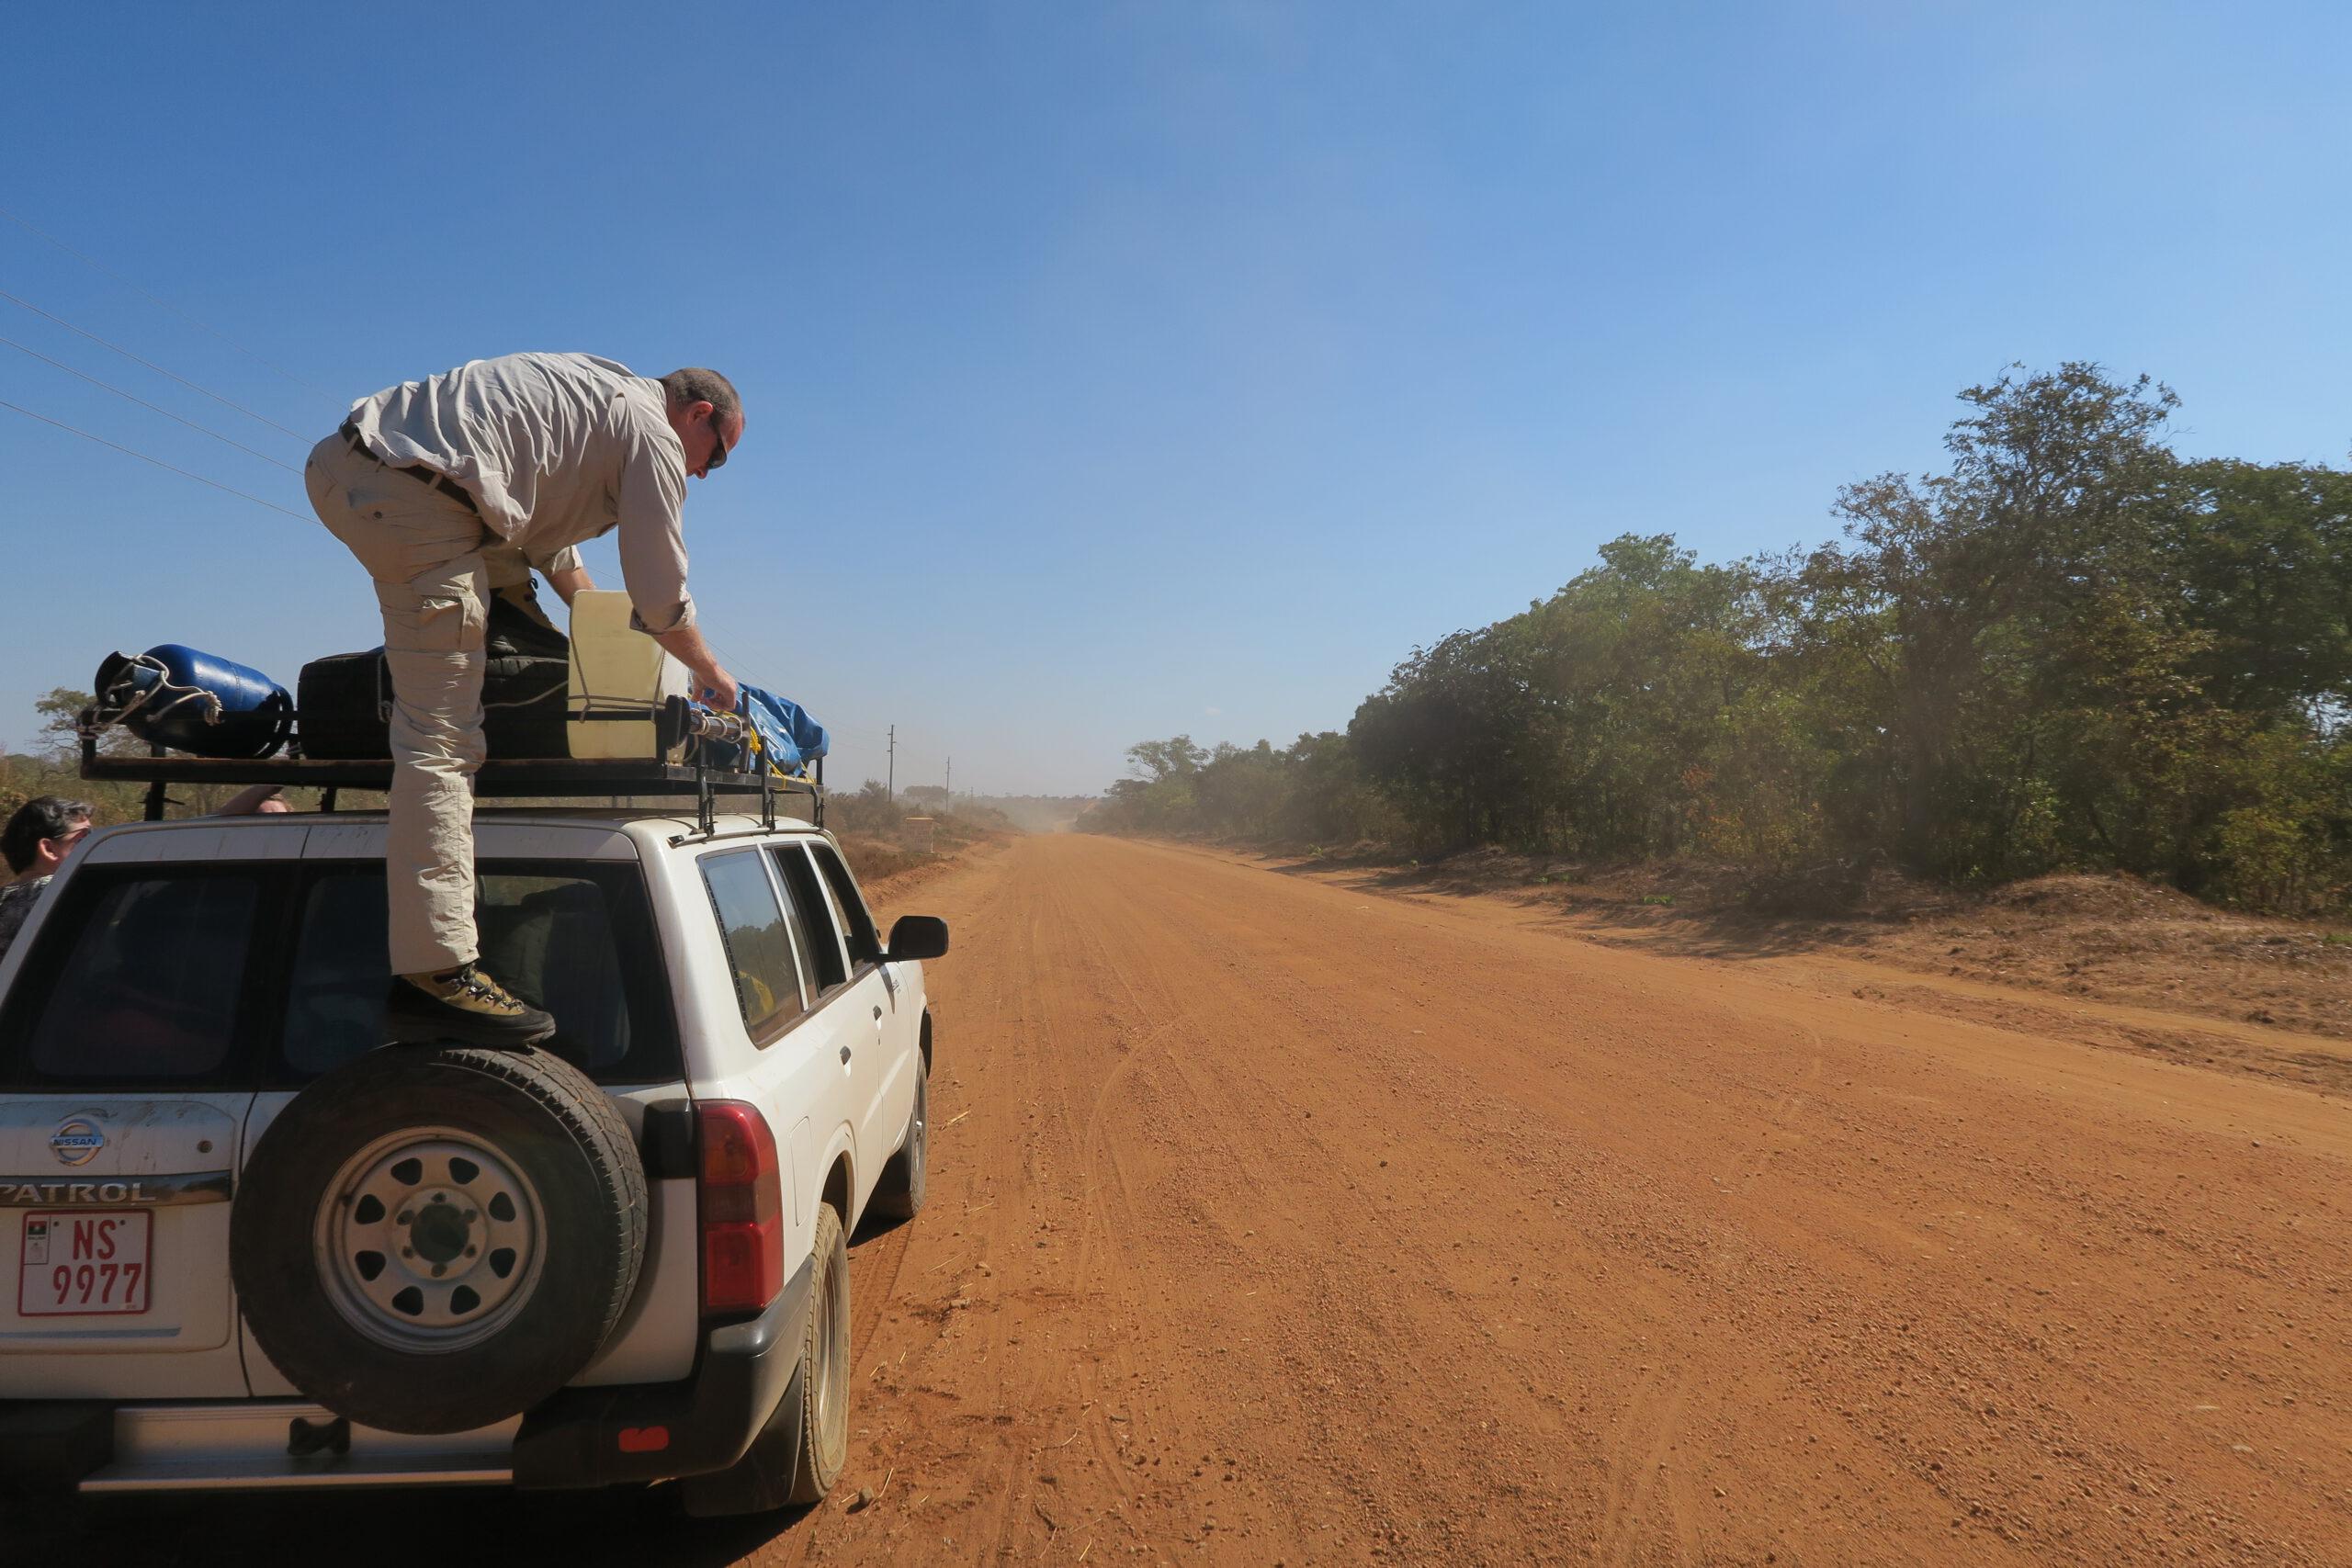 Gravel road naar Lukusuzi National Park Zambia